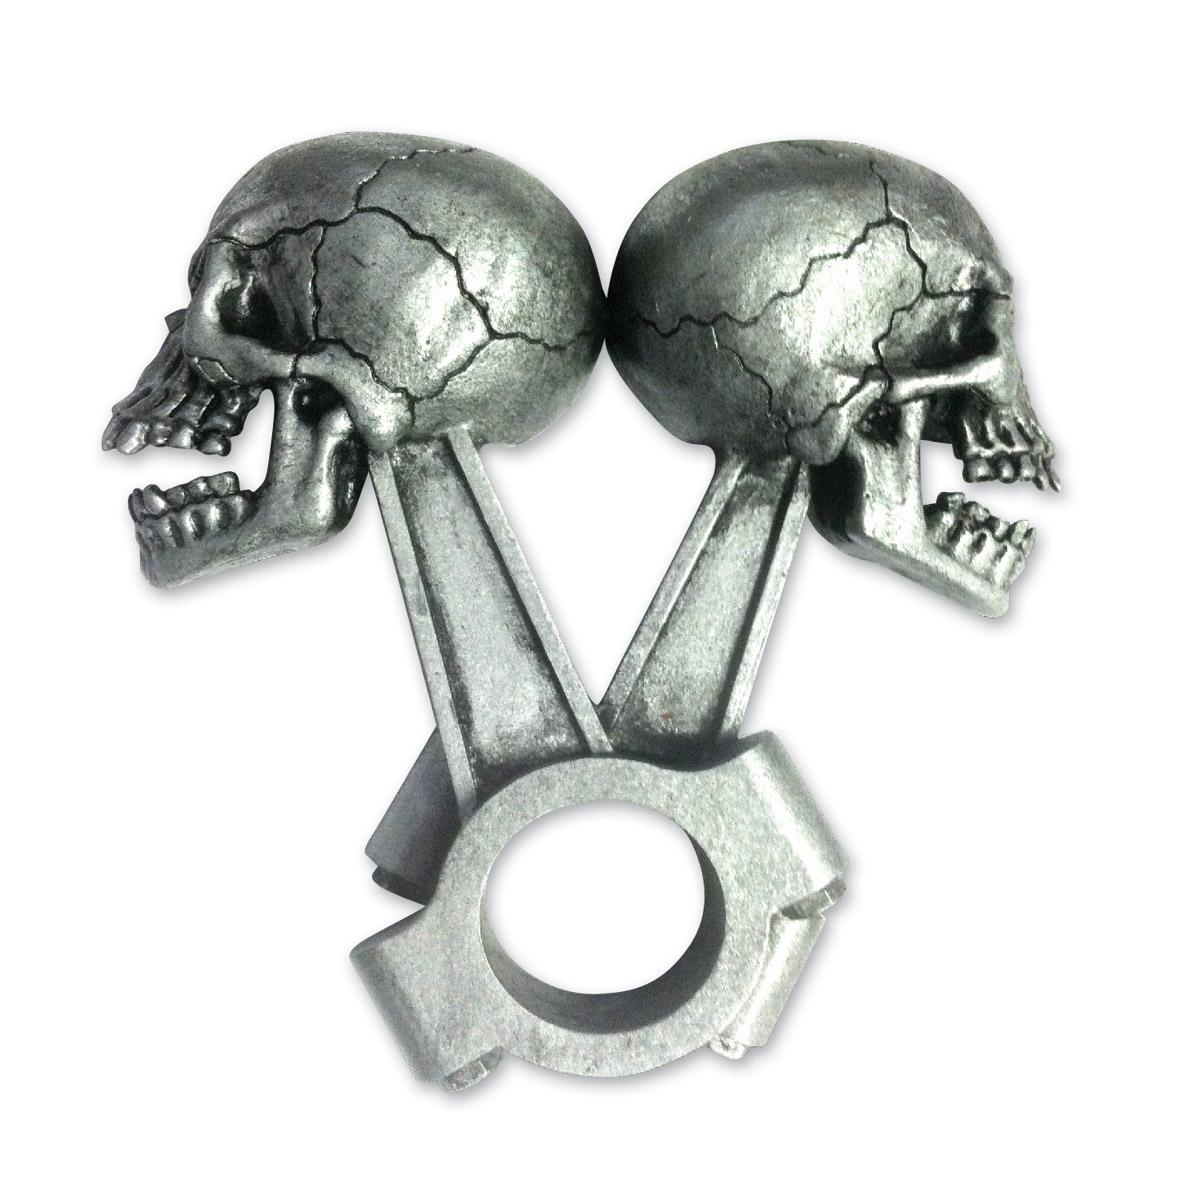 Lethal Threat Piston Skull 3-D Emblem